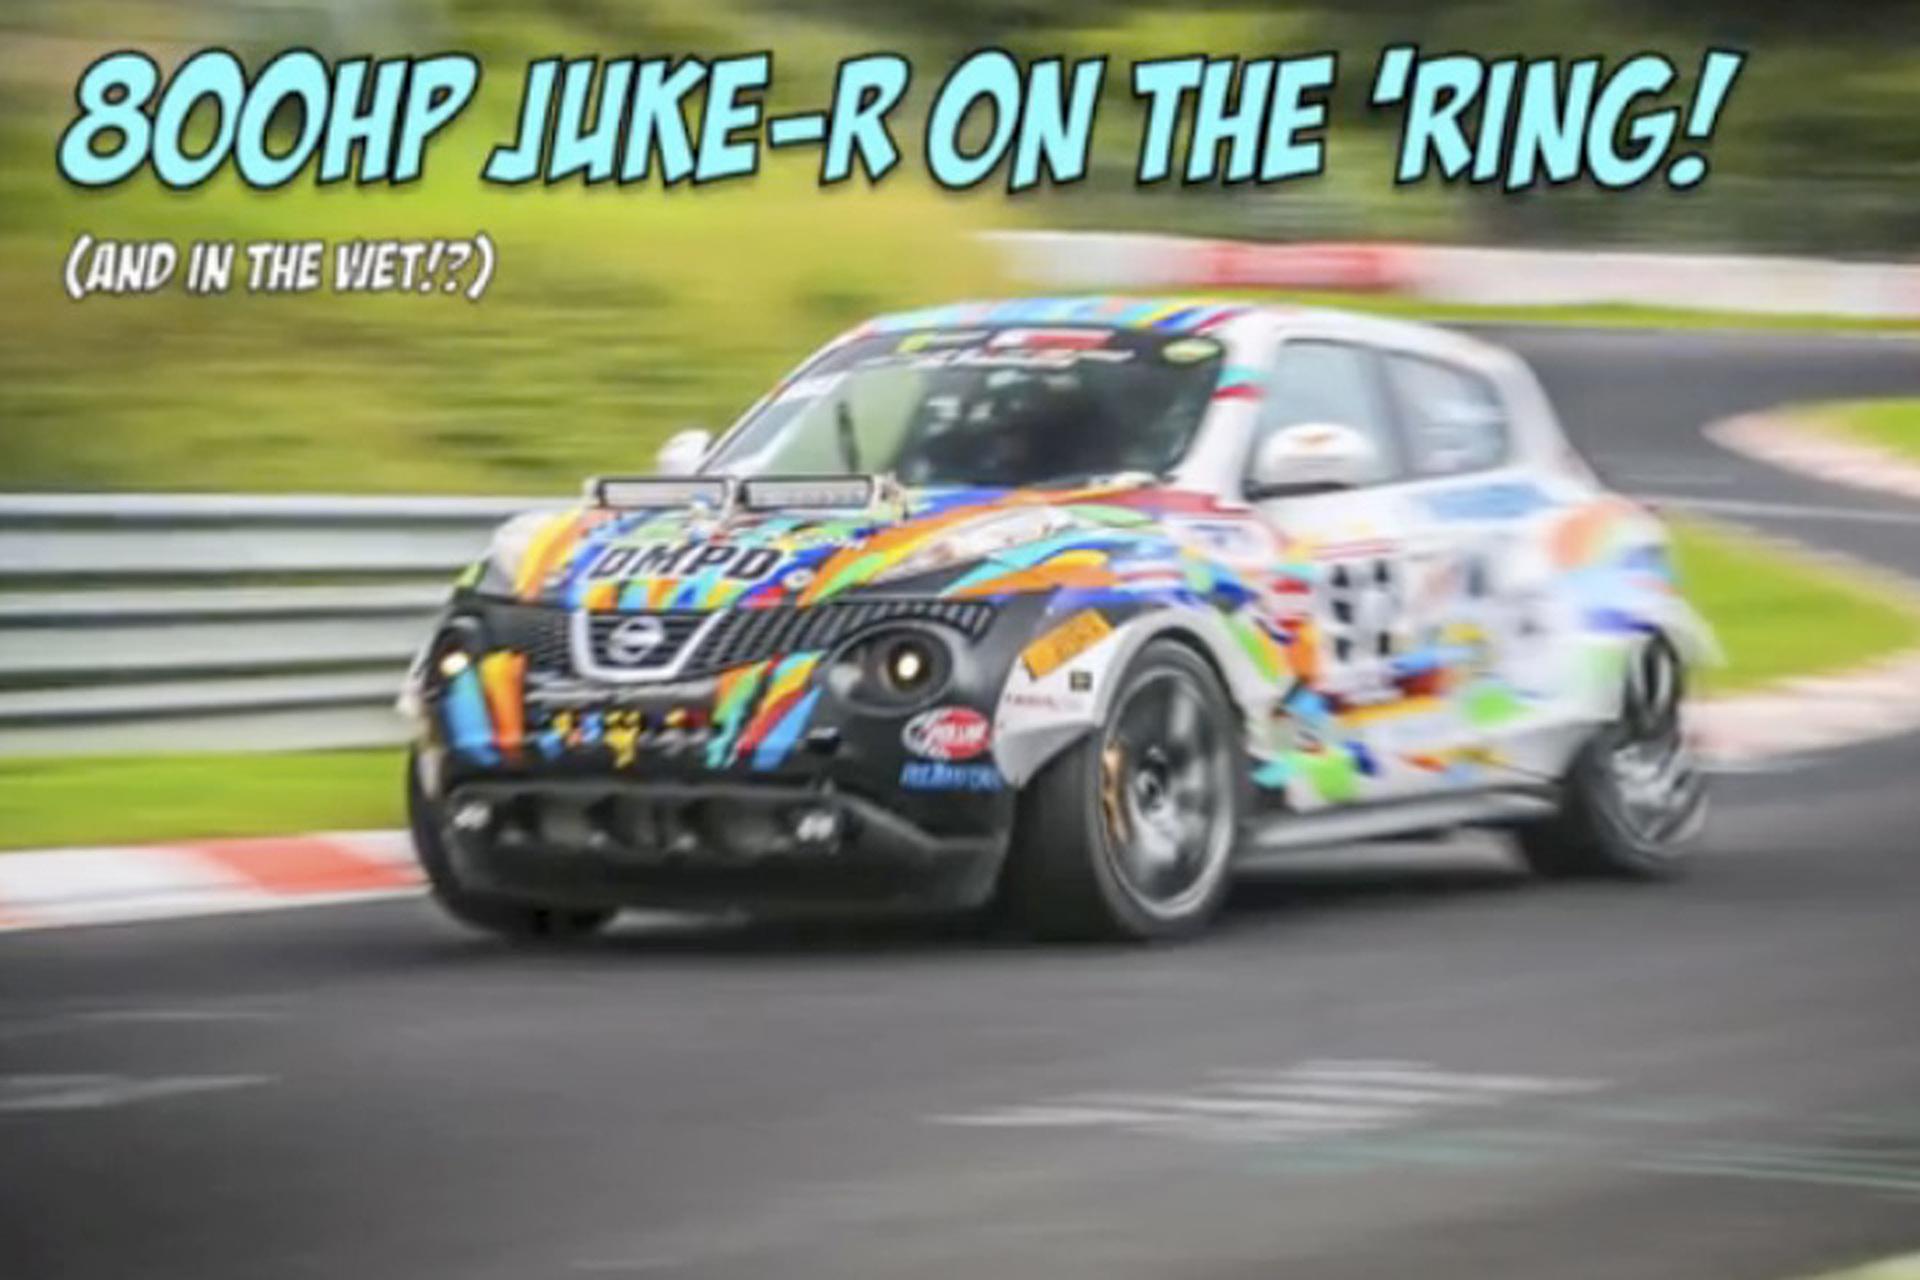 Watch 800hp Nissan Juke-R Hound the Nurburgring [Video]